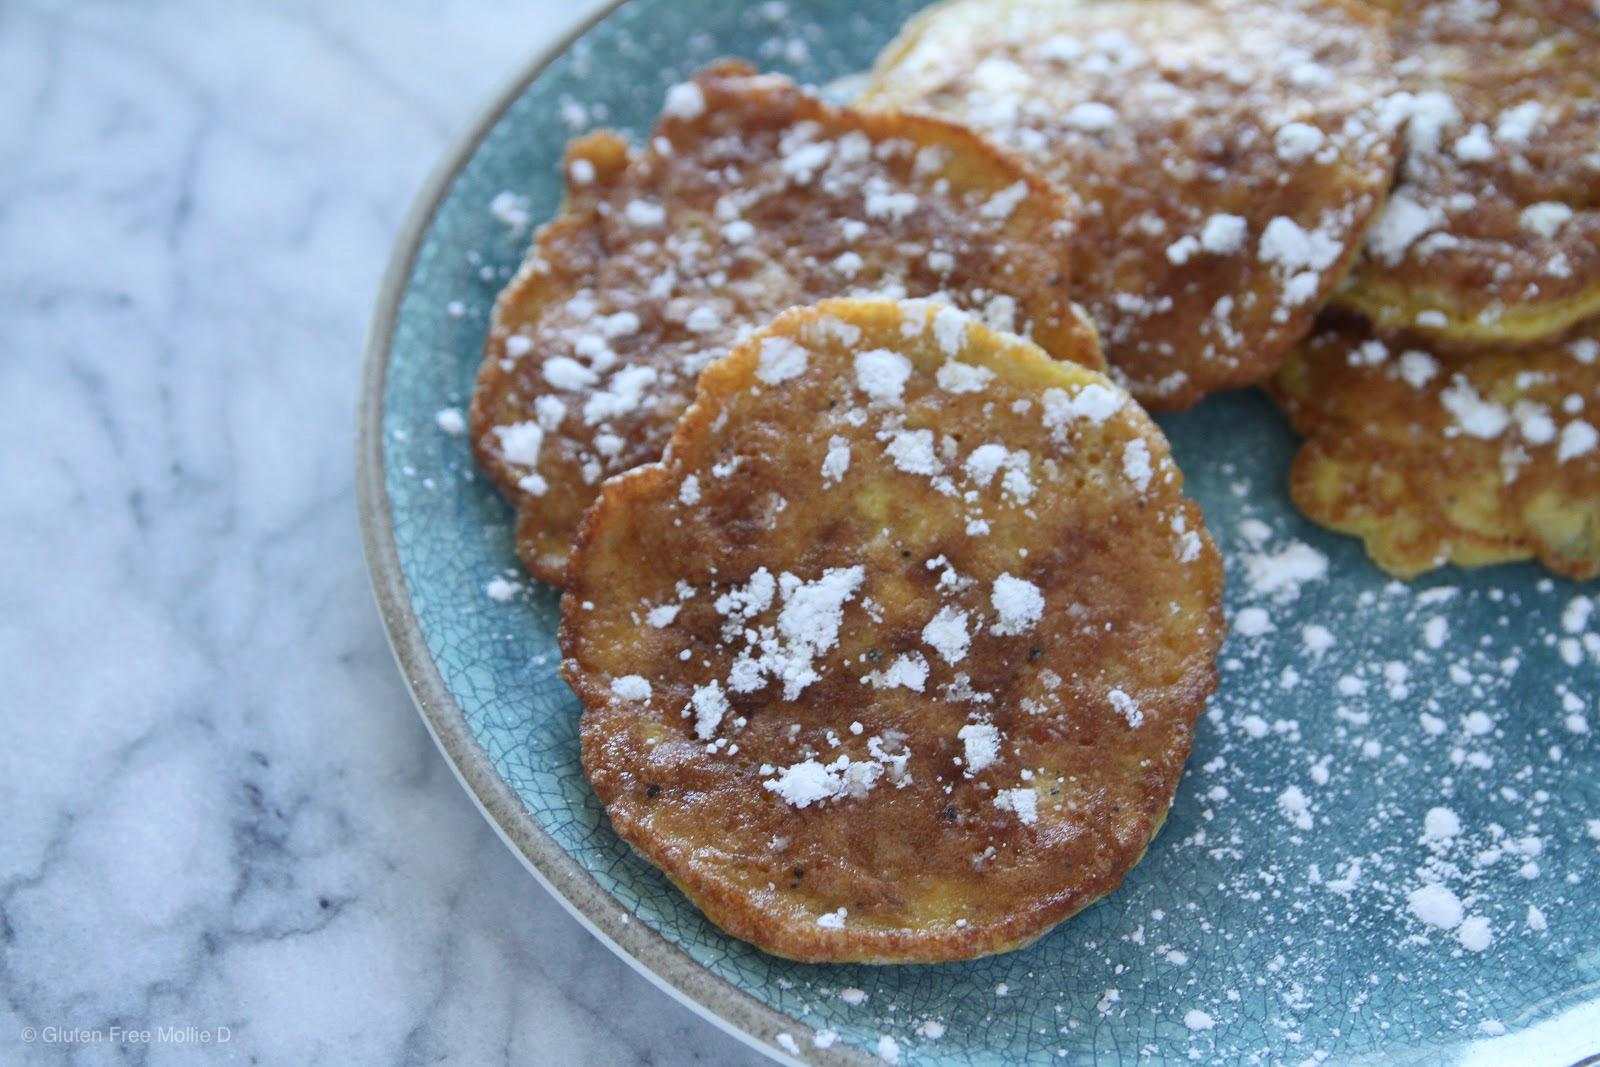 Gluten free matzah pancakes - for Passover!